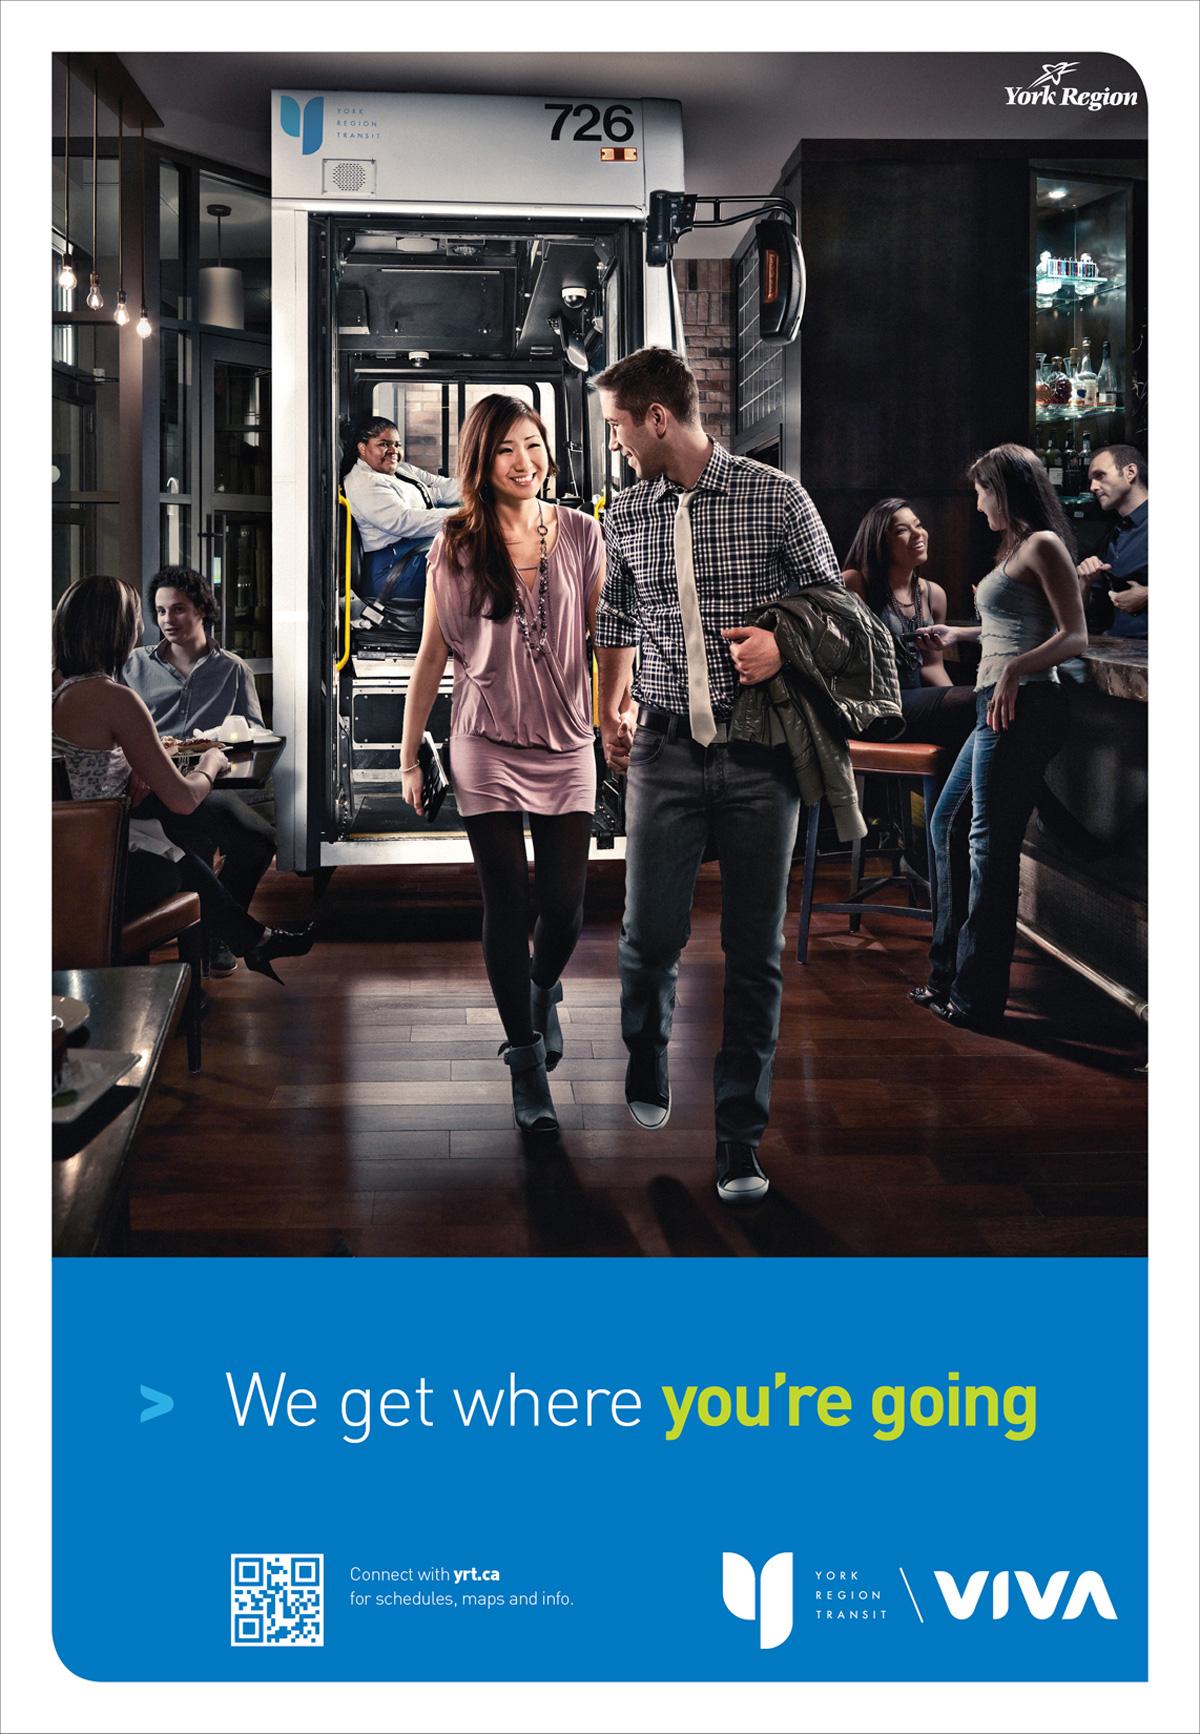 york region transit 2012 ridership poster